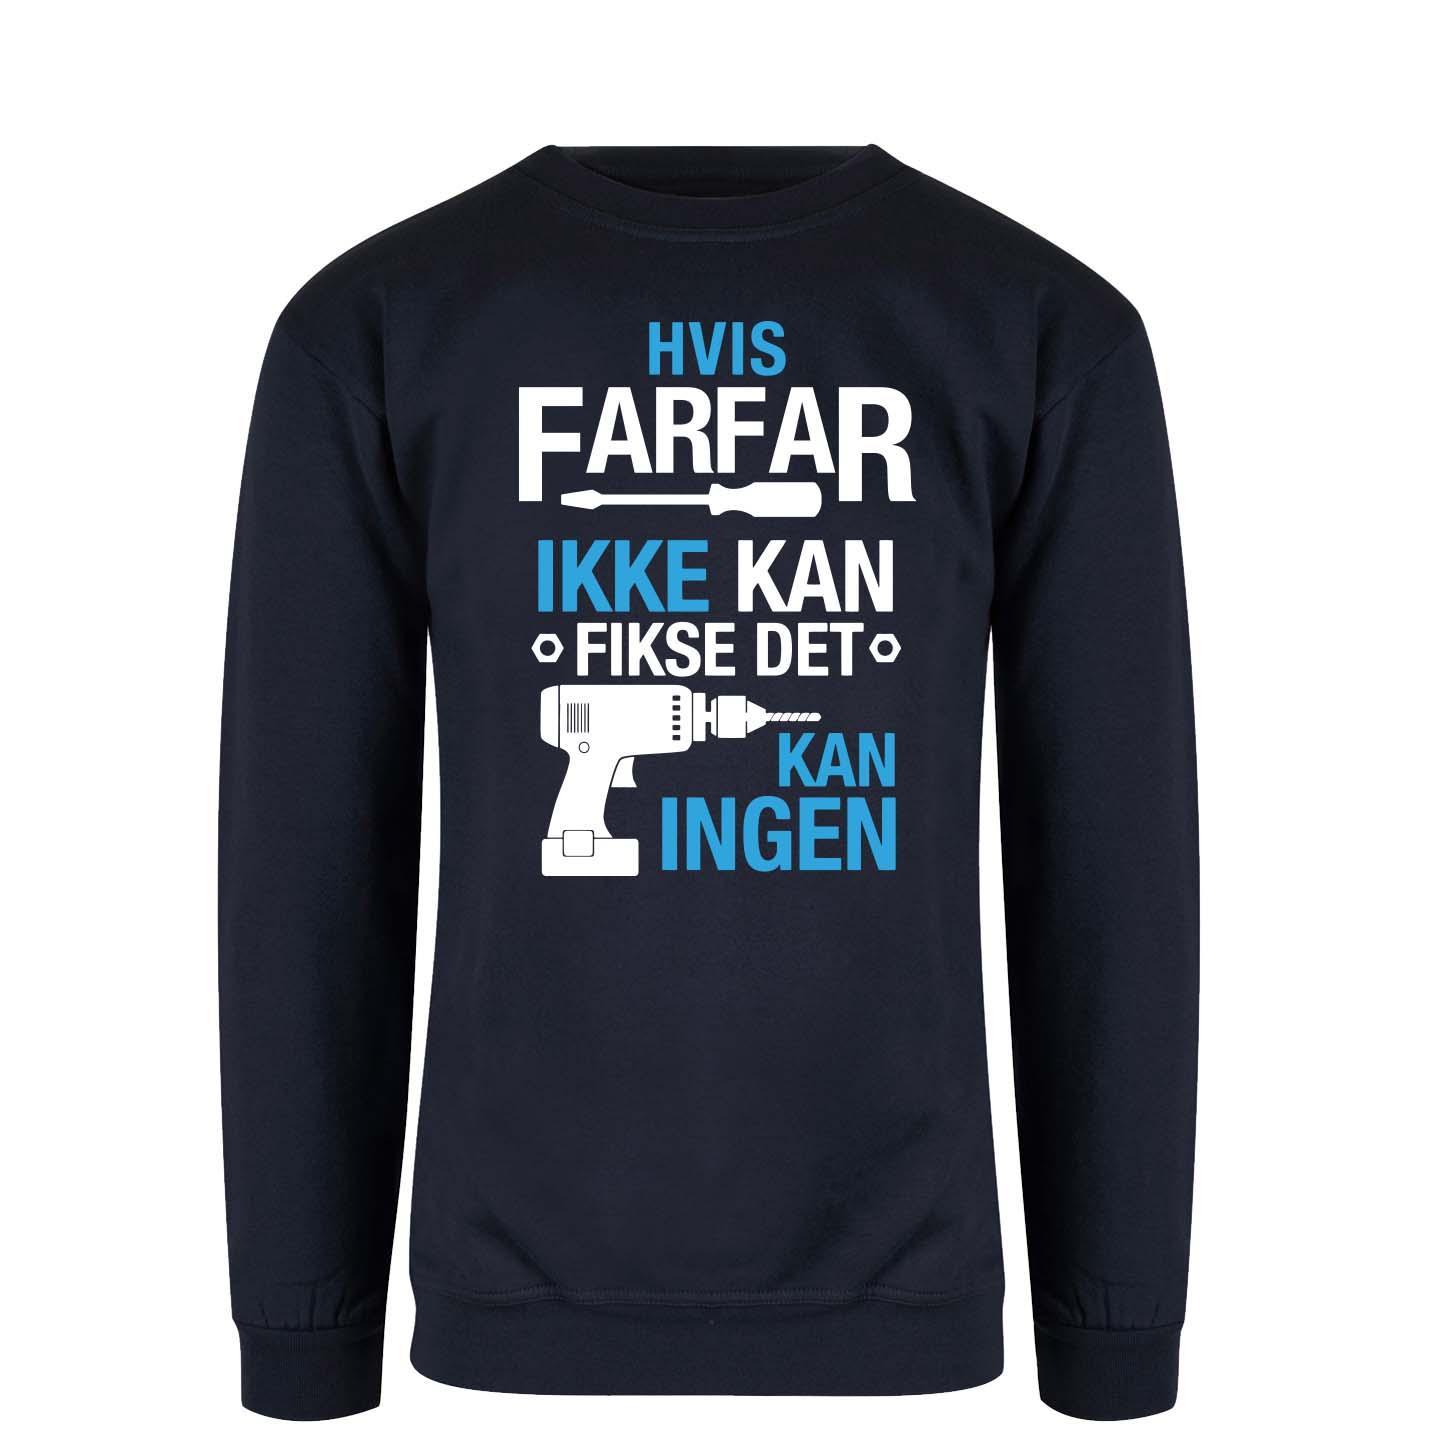 FARFAR Fikse t skjorte Ekte Bajas